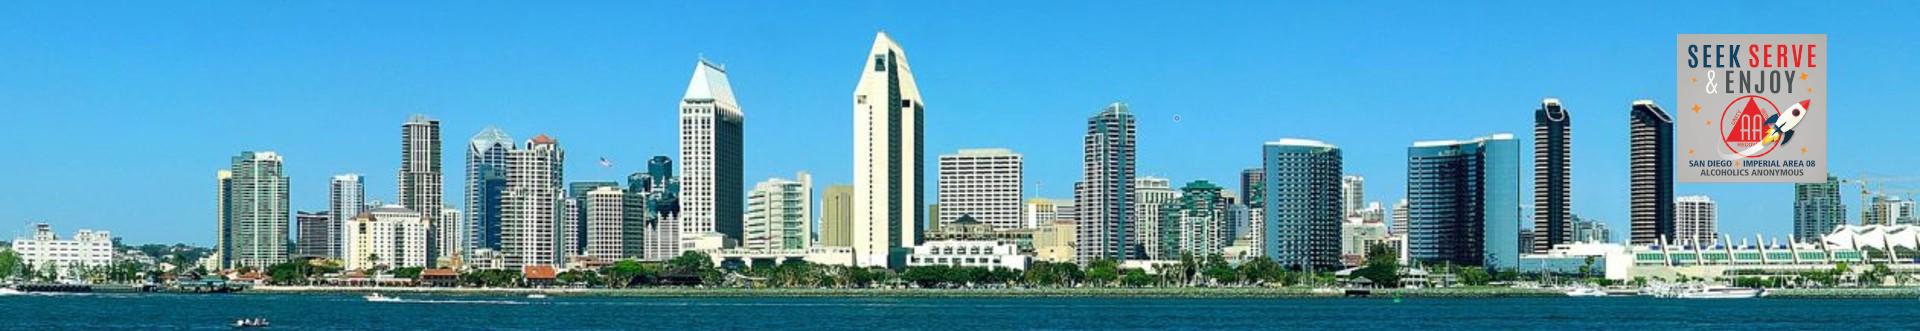 San Diego Imperial Area 08 A.A.